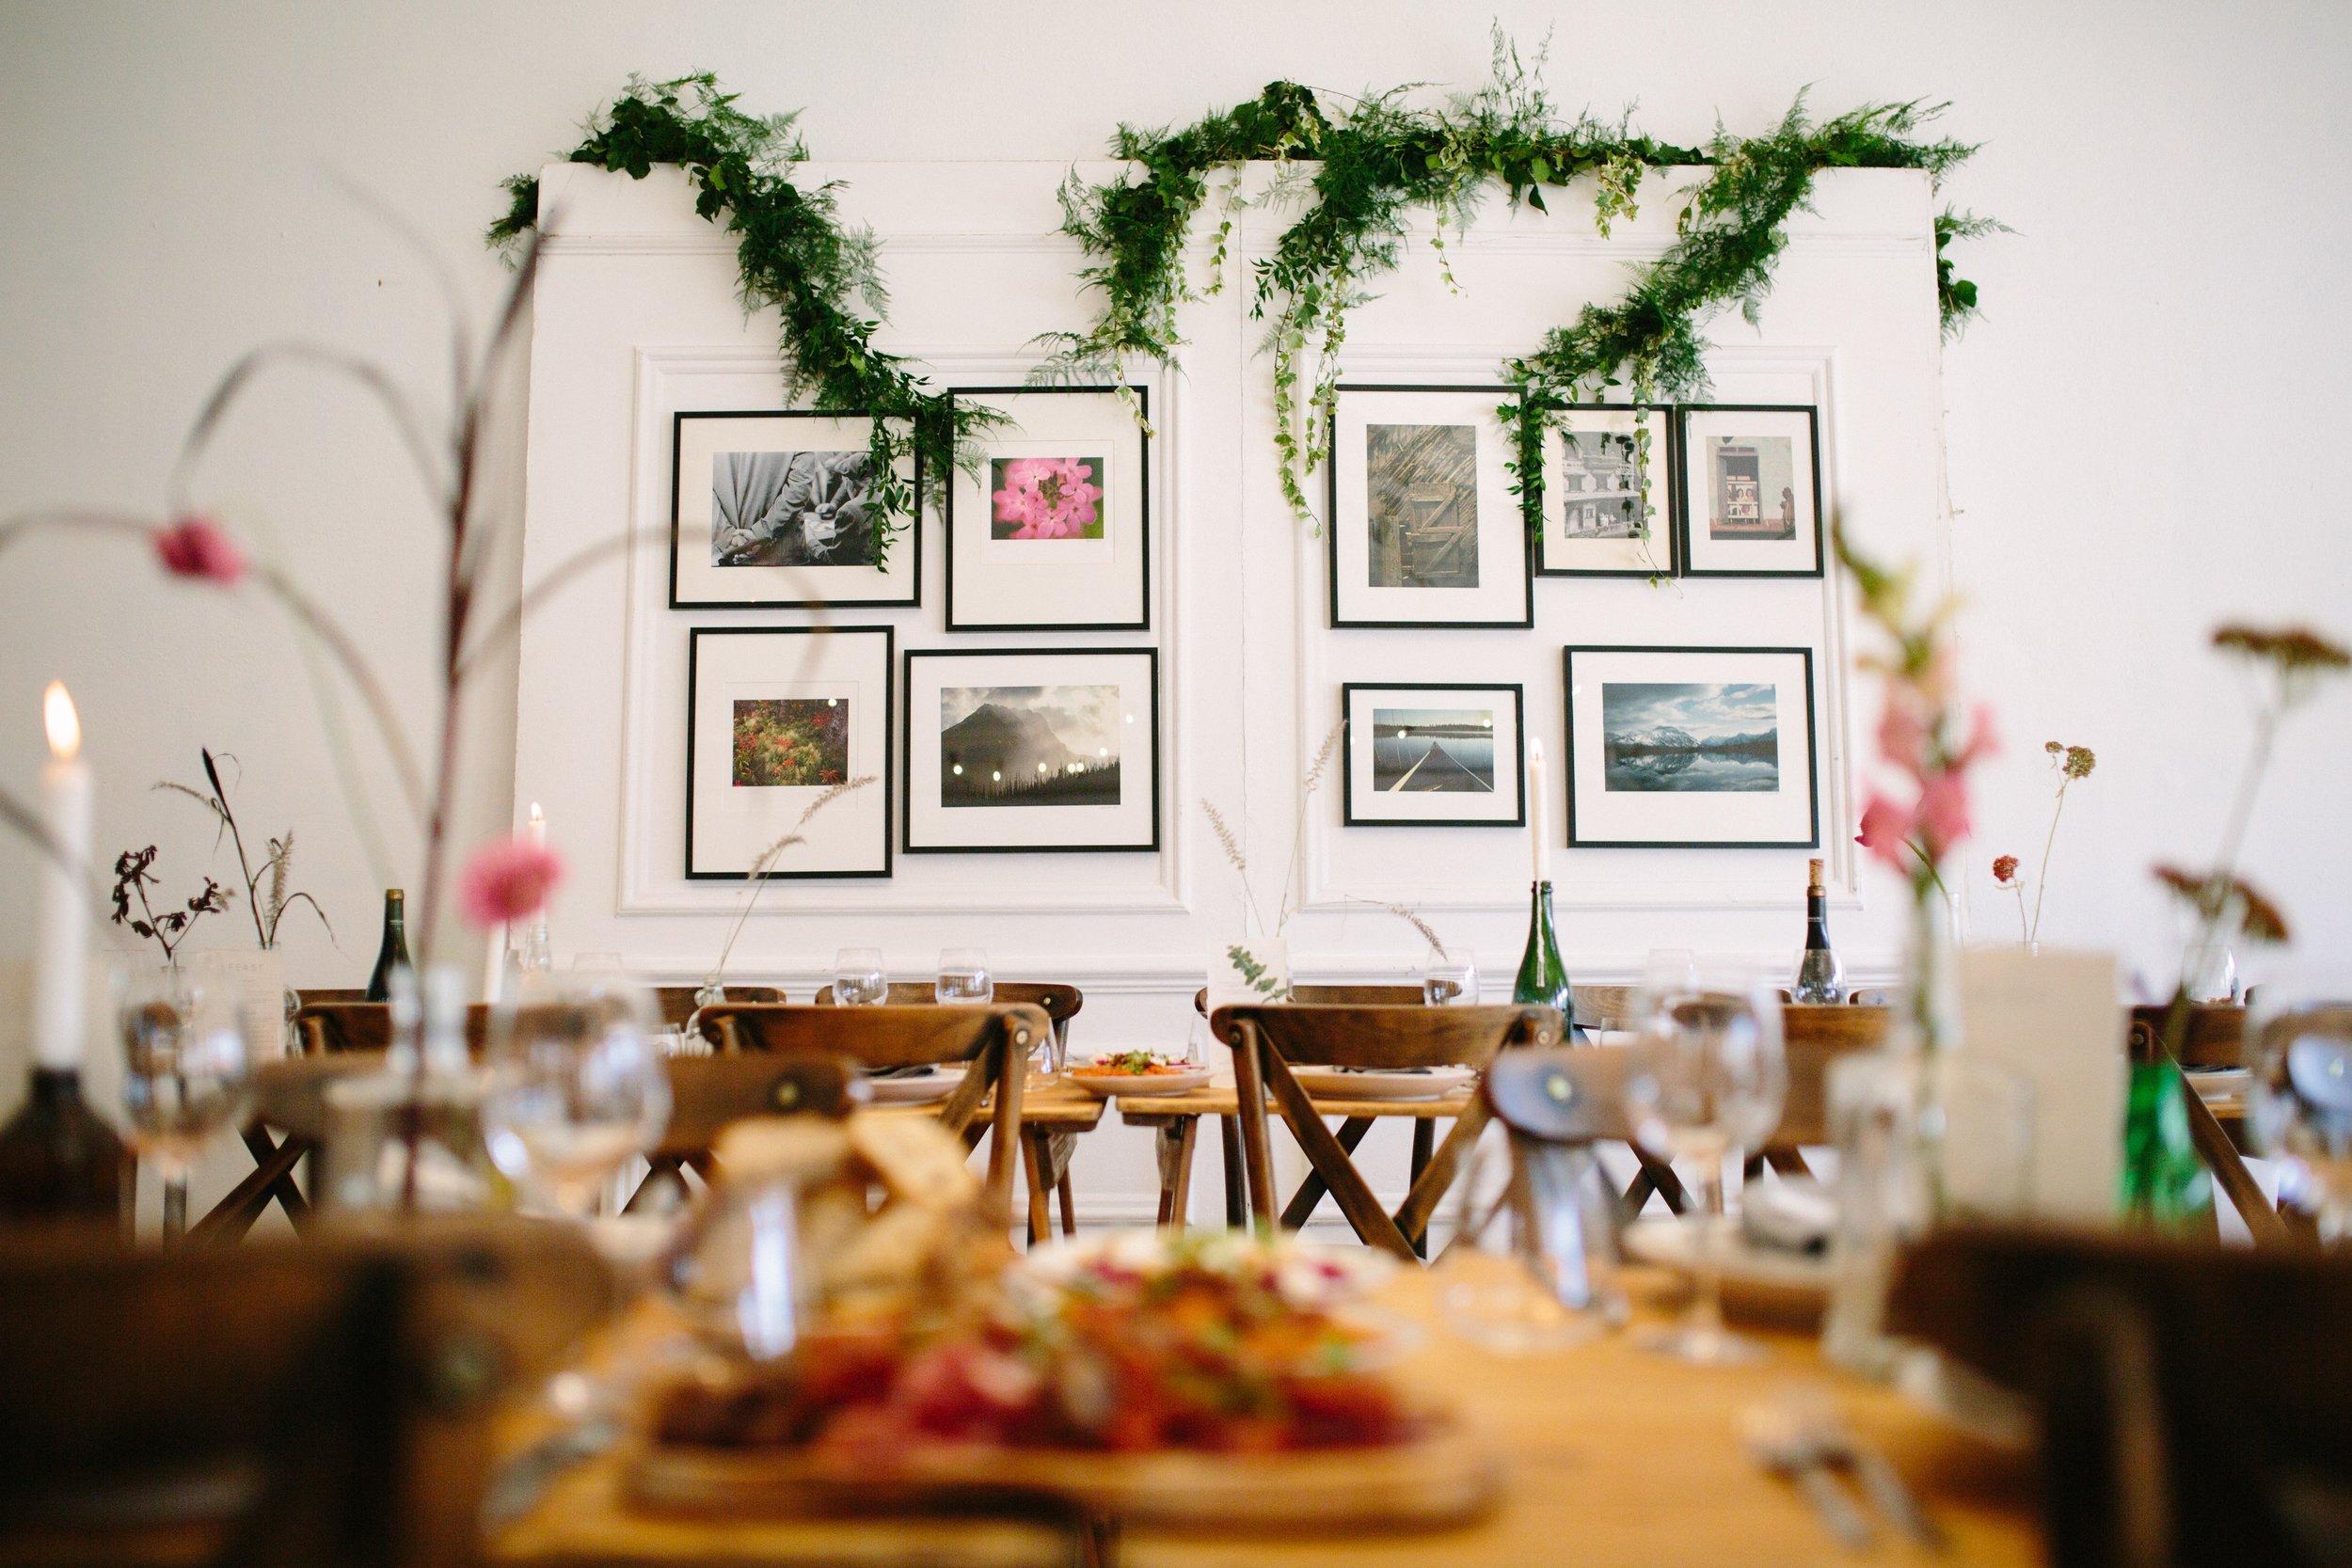 Warehouse Wedding Venue, Non-traditional wedding planner, London Wedding coordination, Event Bar, Bespoke weddings, Shoreditch Wedding, informal, Stylish, Event Planning